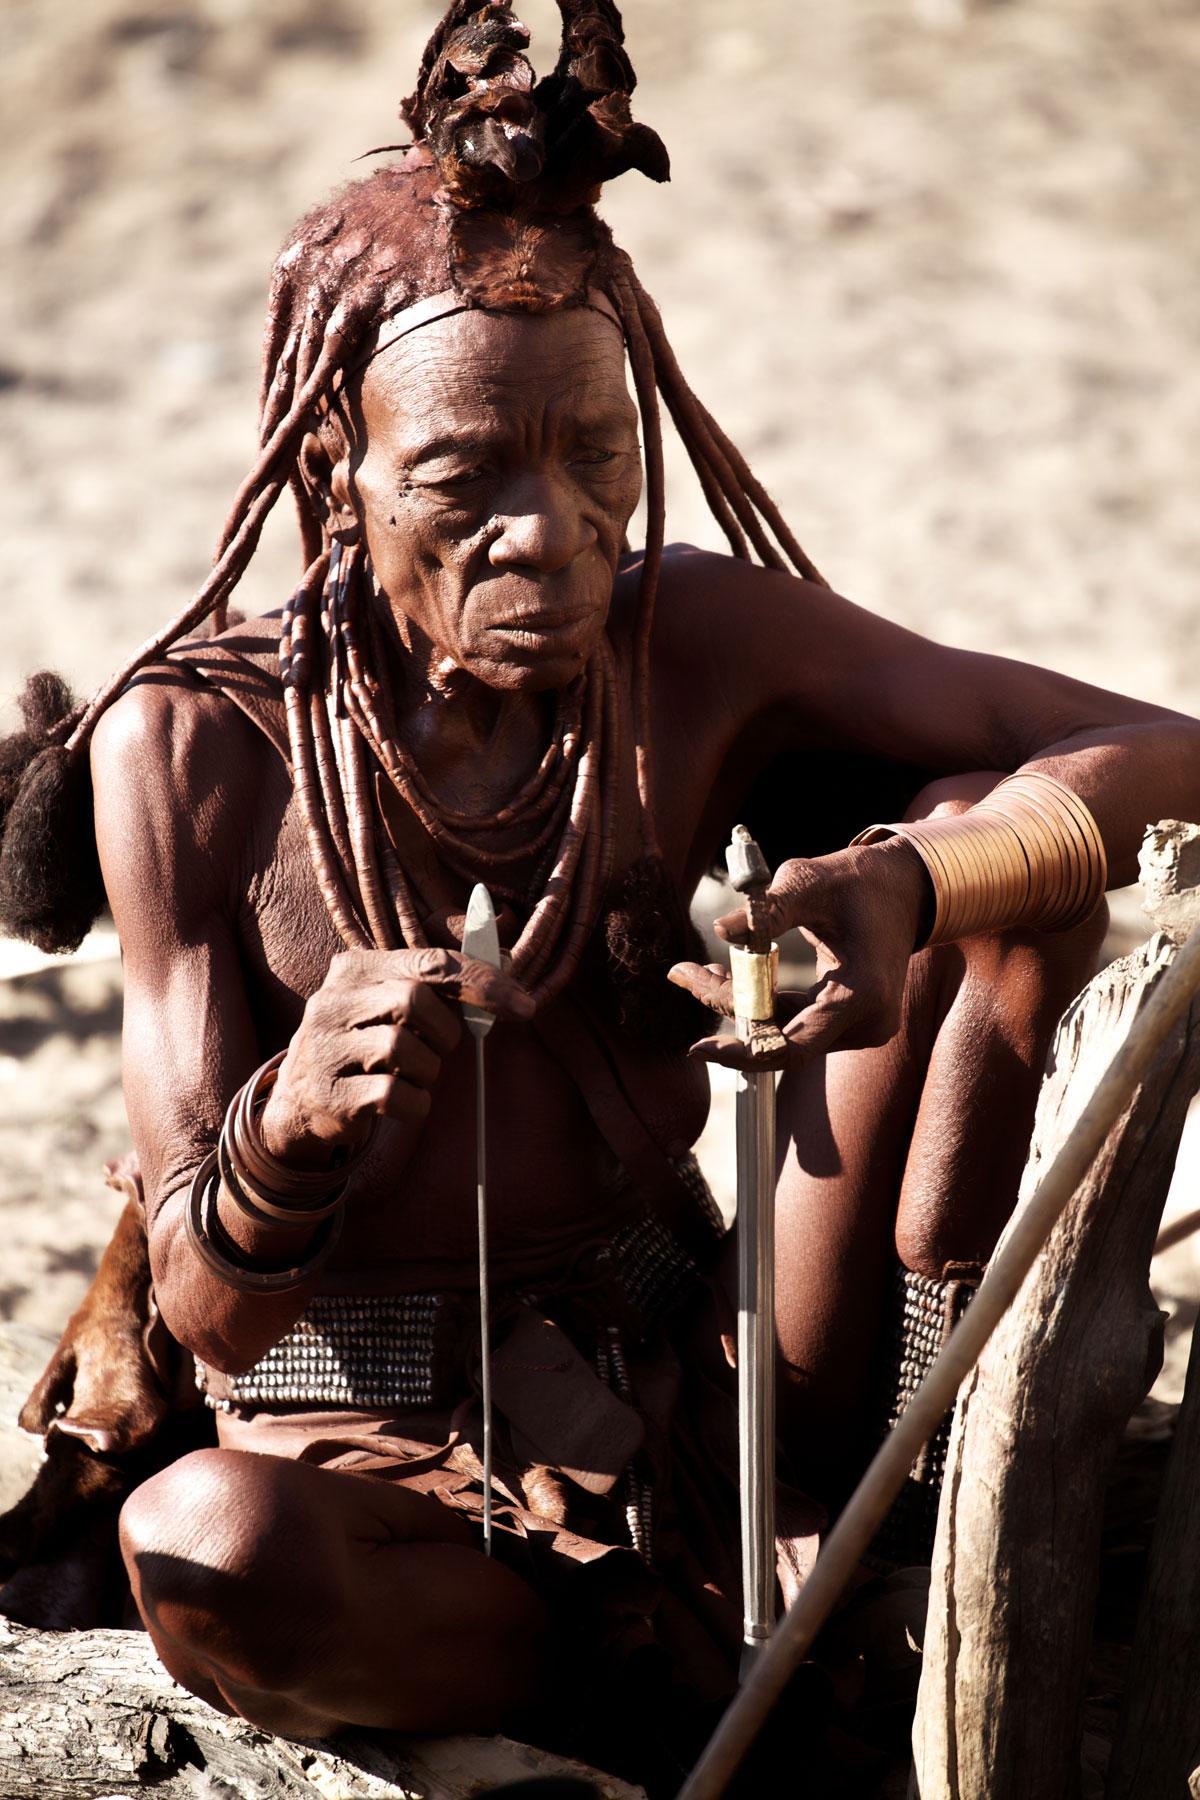 namibia_003_SP